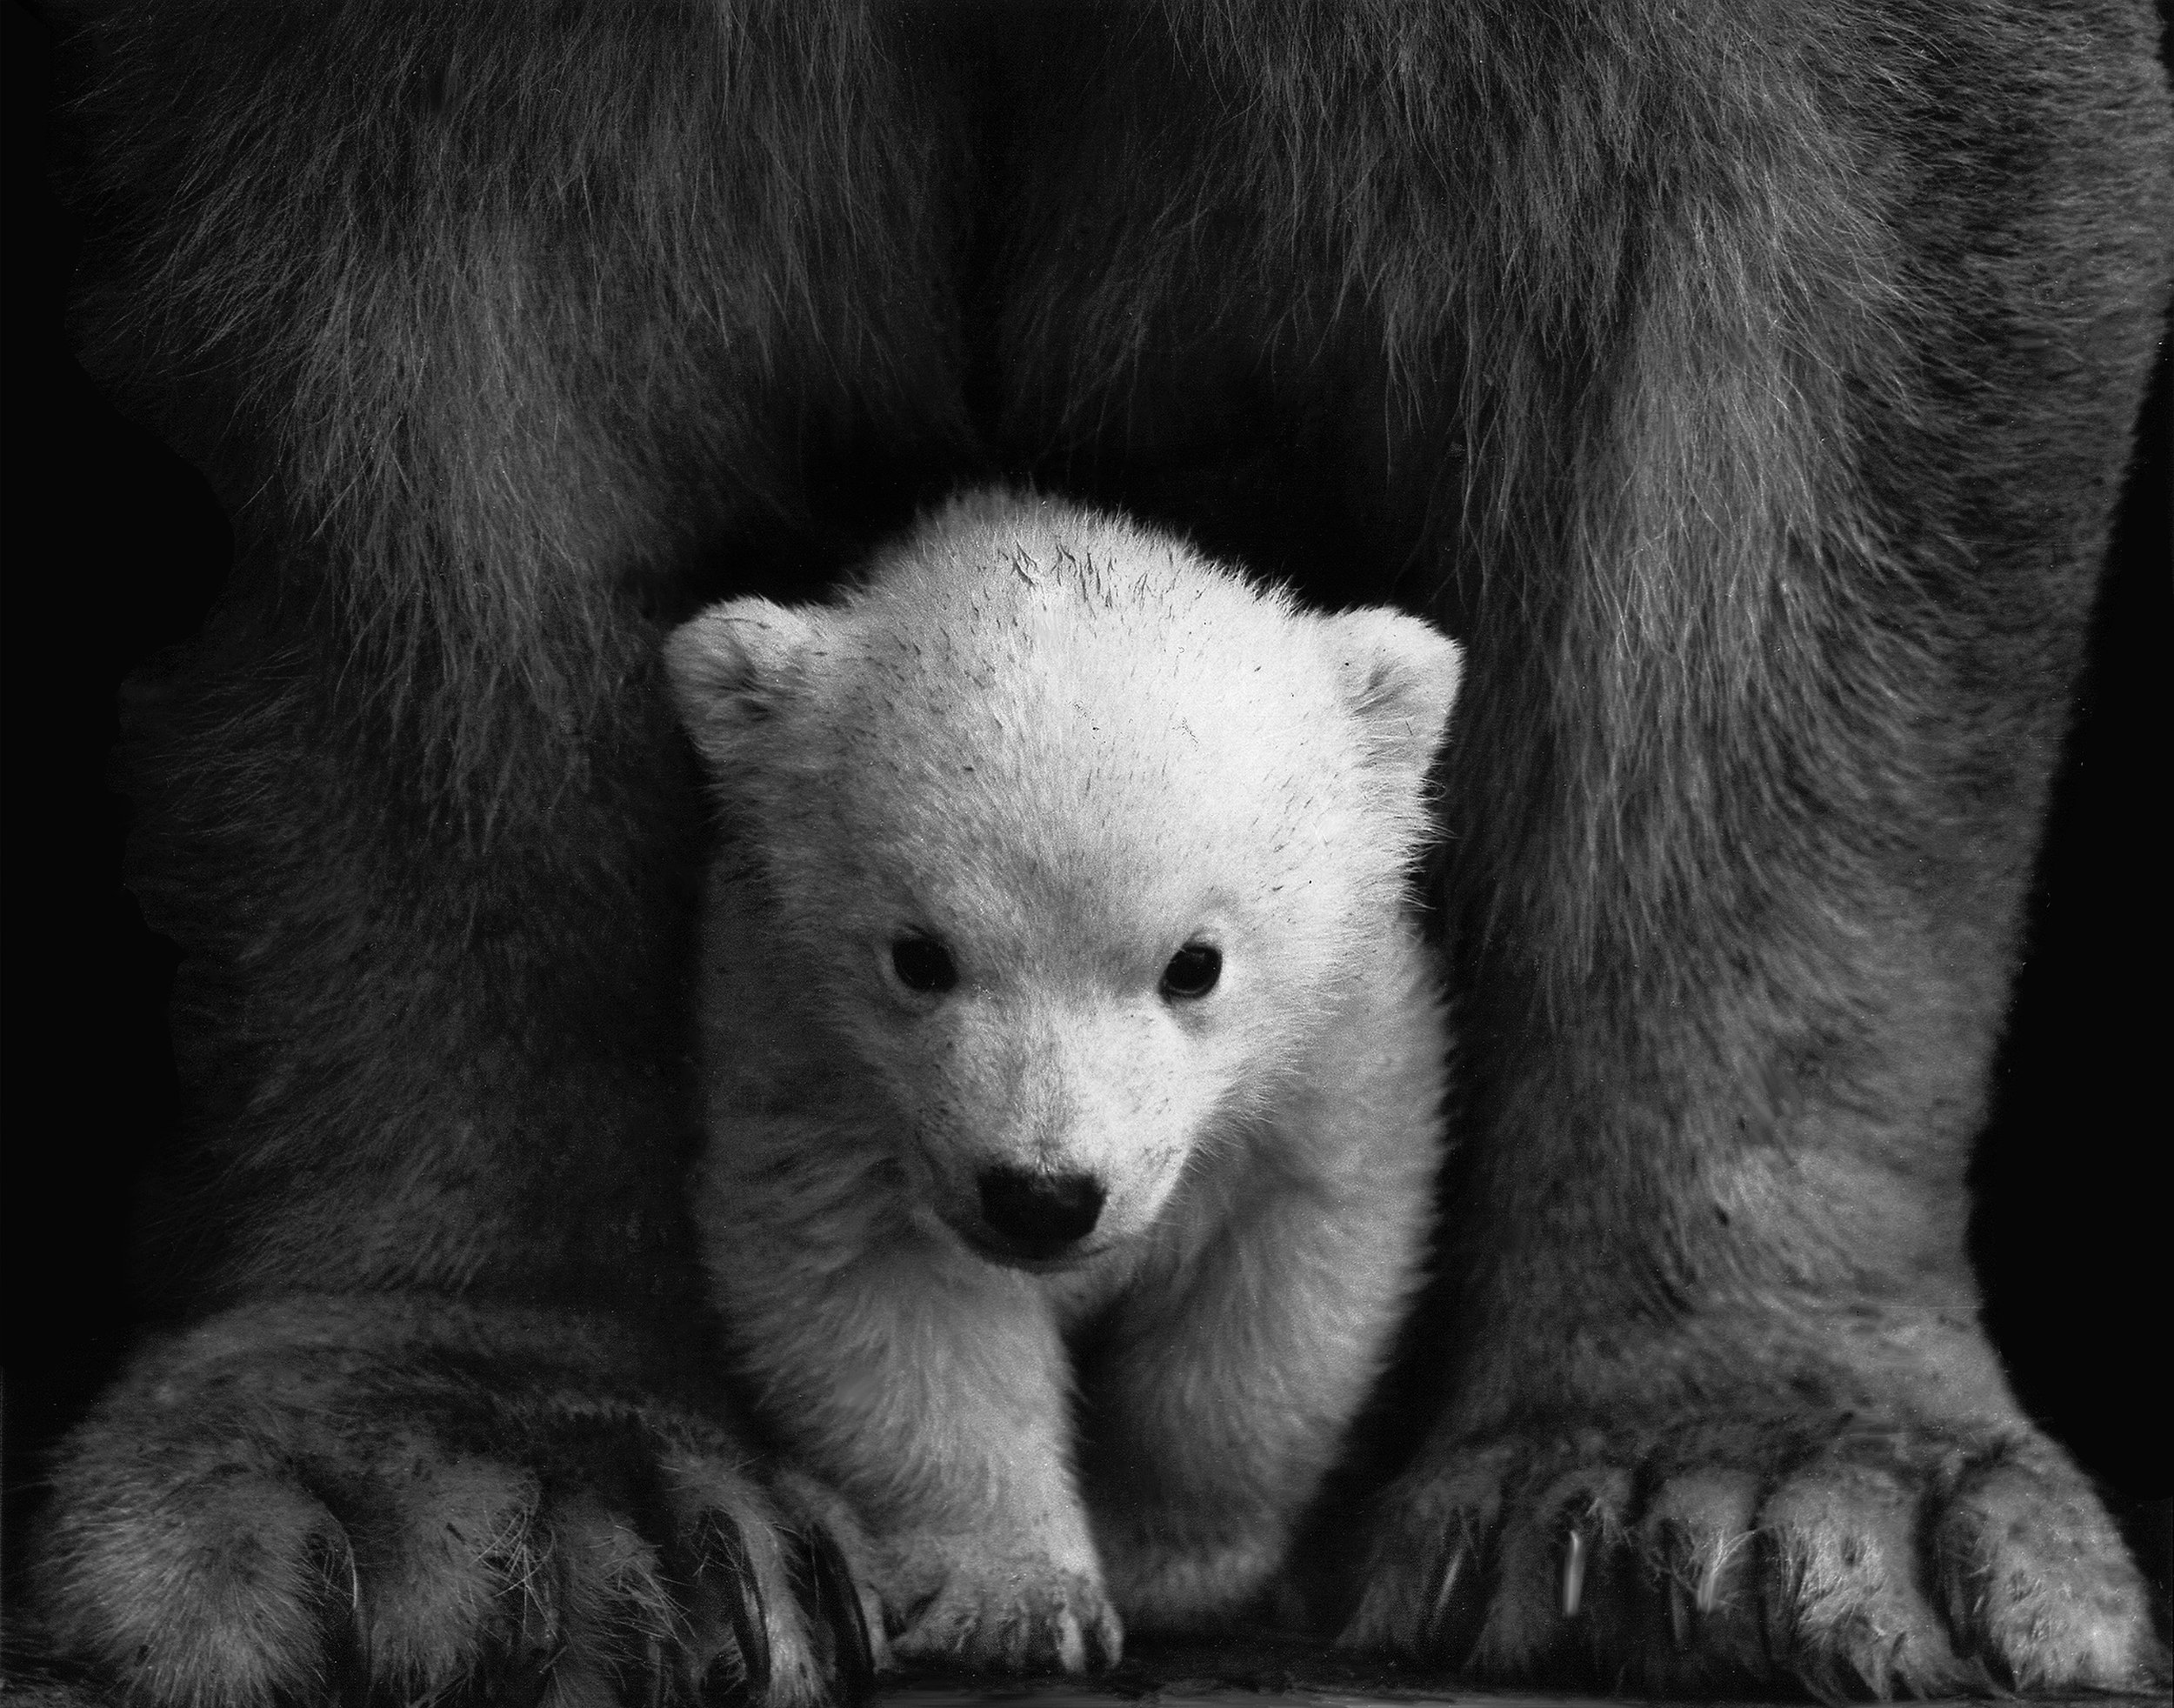 animal-animal-photography-bear-598966.jpg